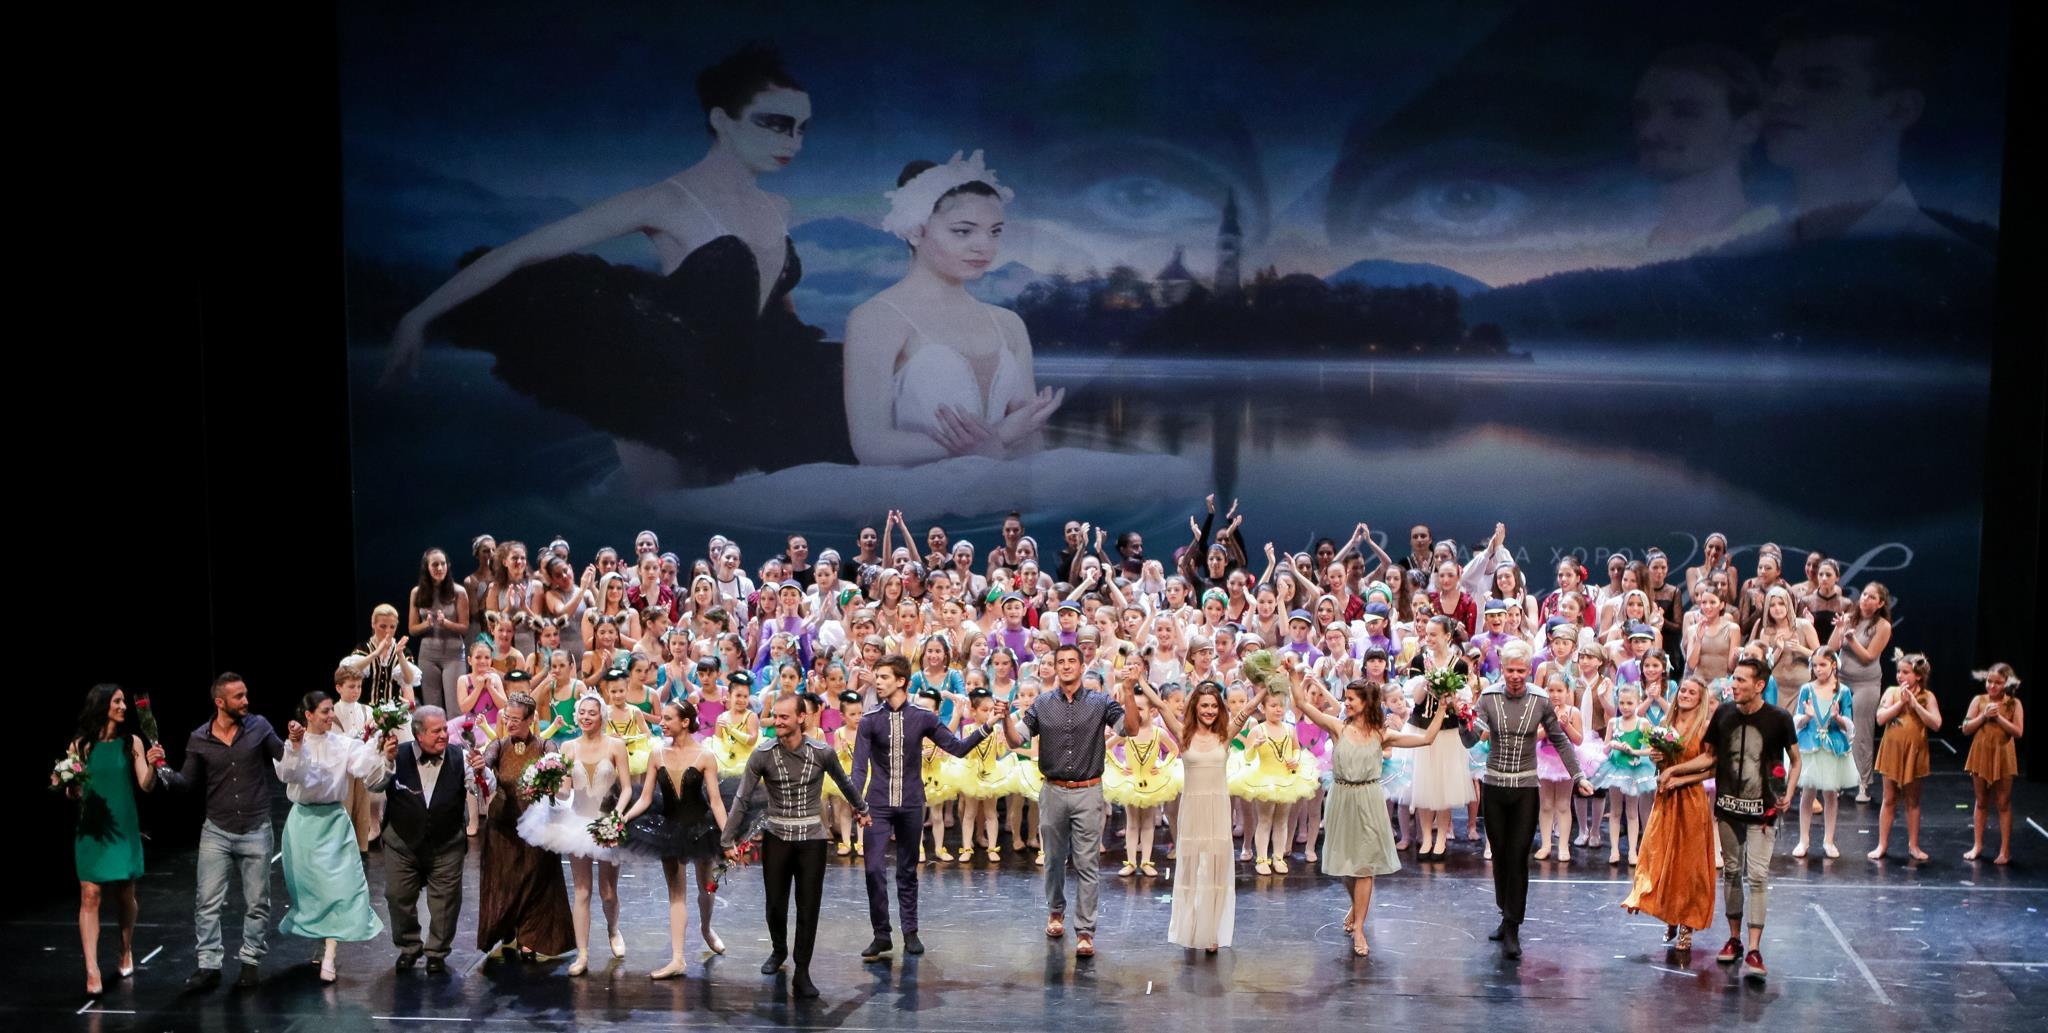 2527db3eae7 ΓΑΛΑΤΟΠΟΥΛΟΥ ΙΣΙΔΩΡΑ - Σχολή Μπαλέτου & Σύγχρονου Χορού - Schools.gr